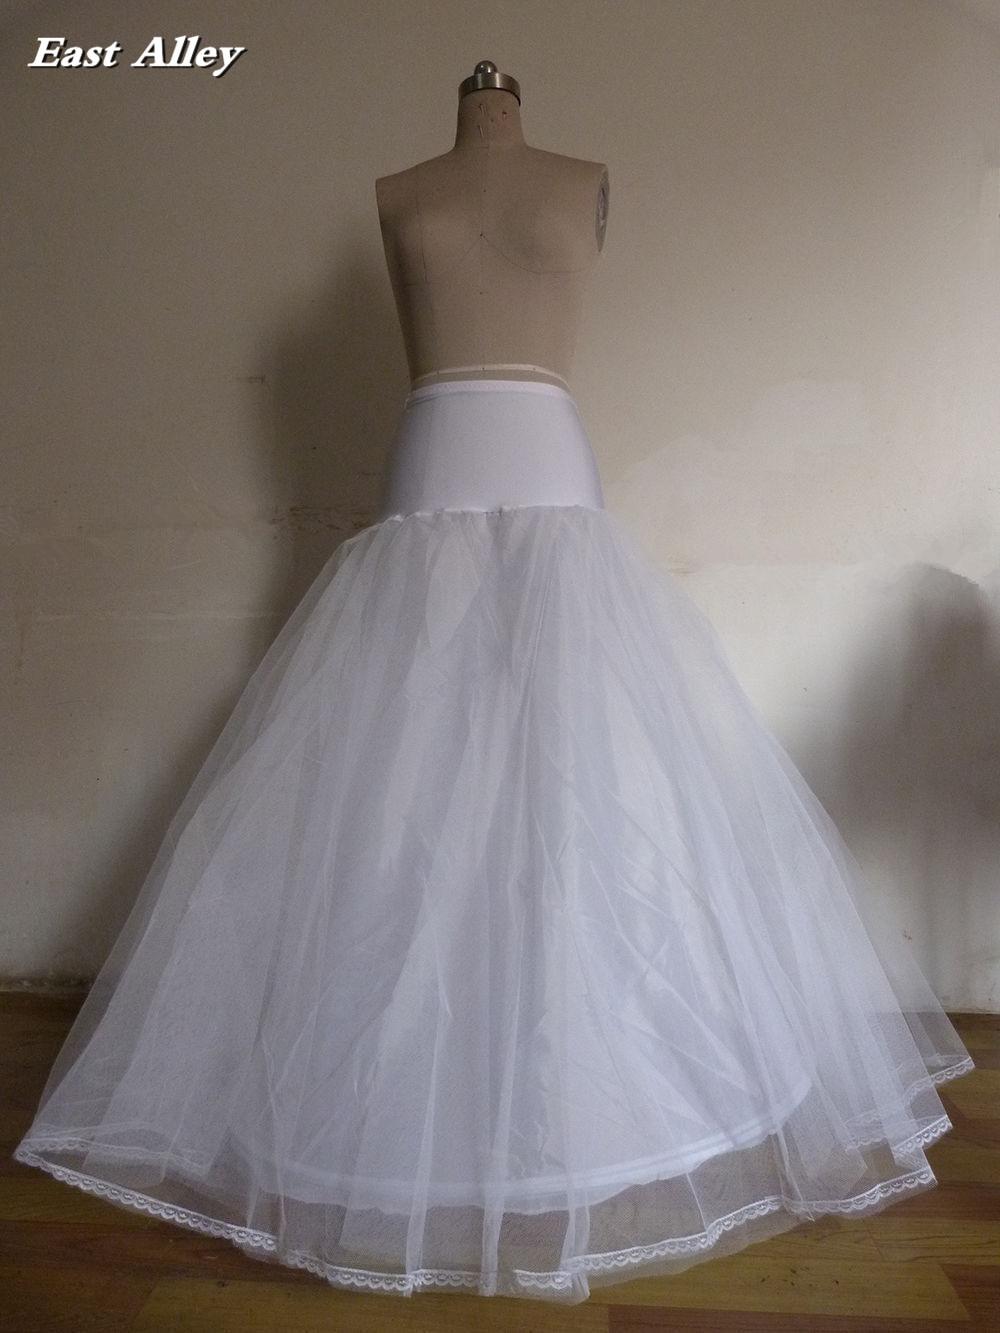 White / Ivory Plus Size Lycra 1 Hoop 2 Layer A-line Wedding Gown Petticoat Crinolines Slips Underskirt